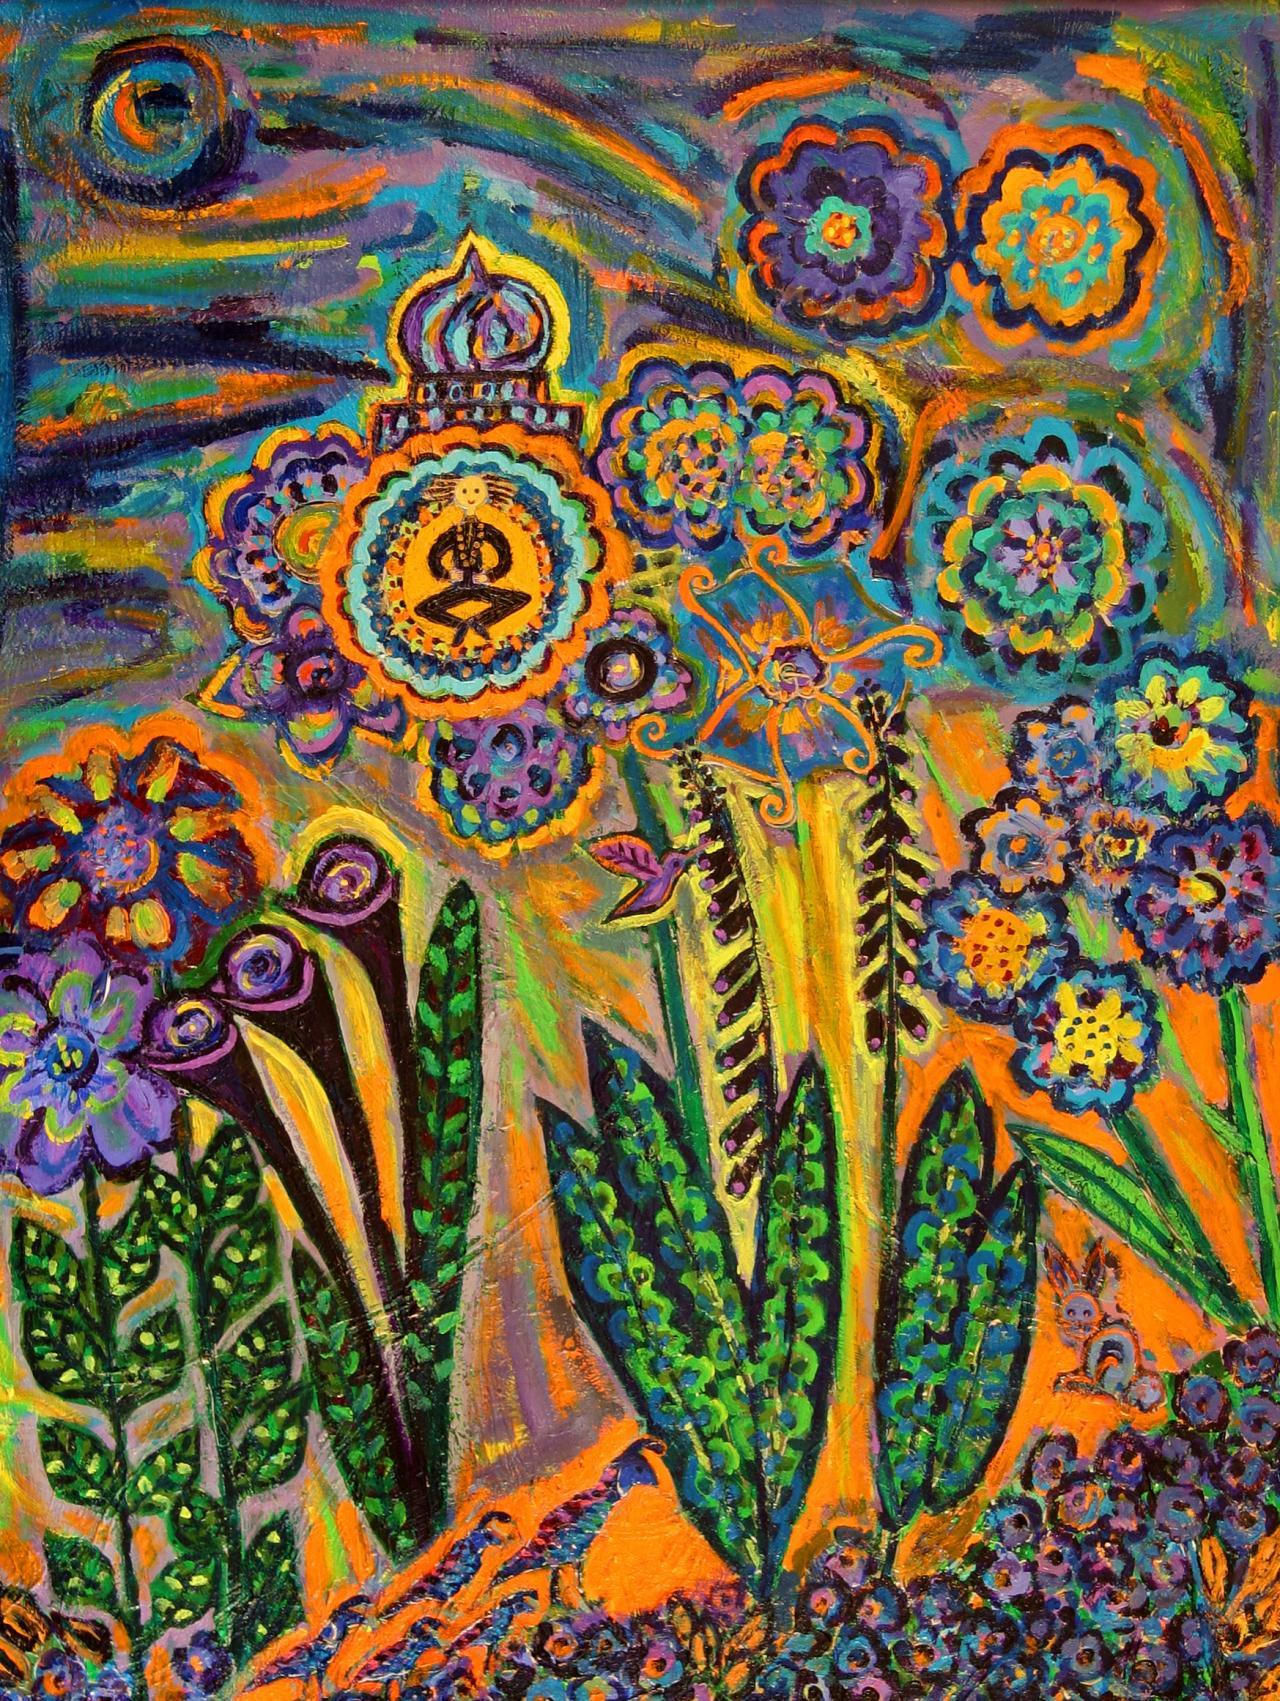 Michael_in_the_Flower_Temple-N.299191238_large.jpg